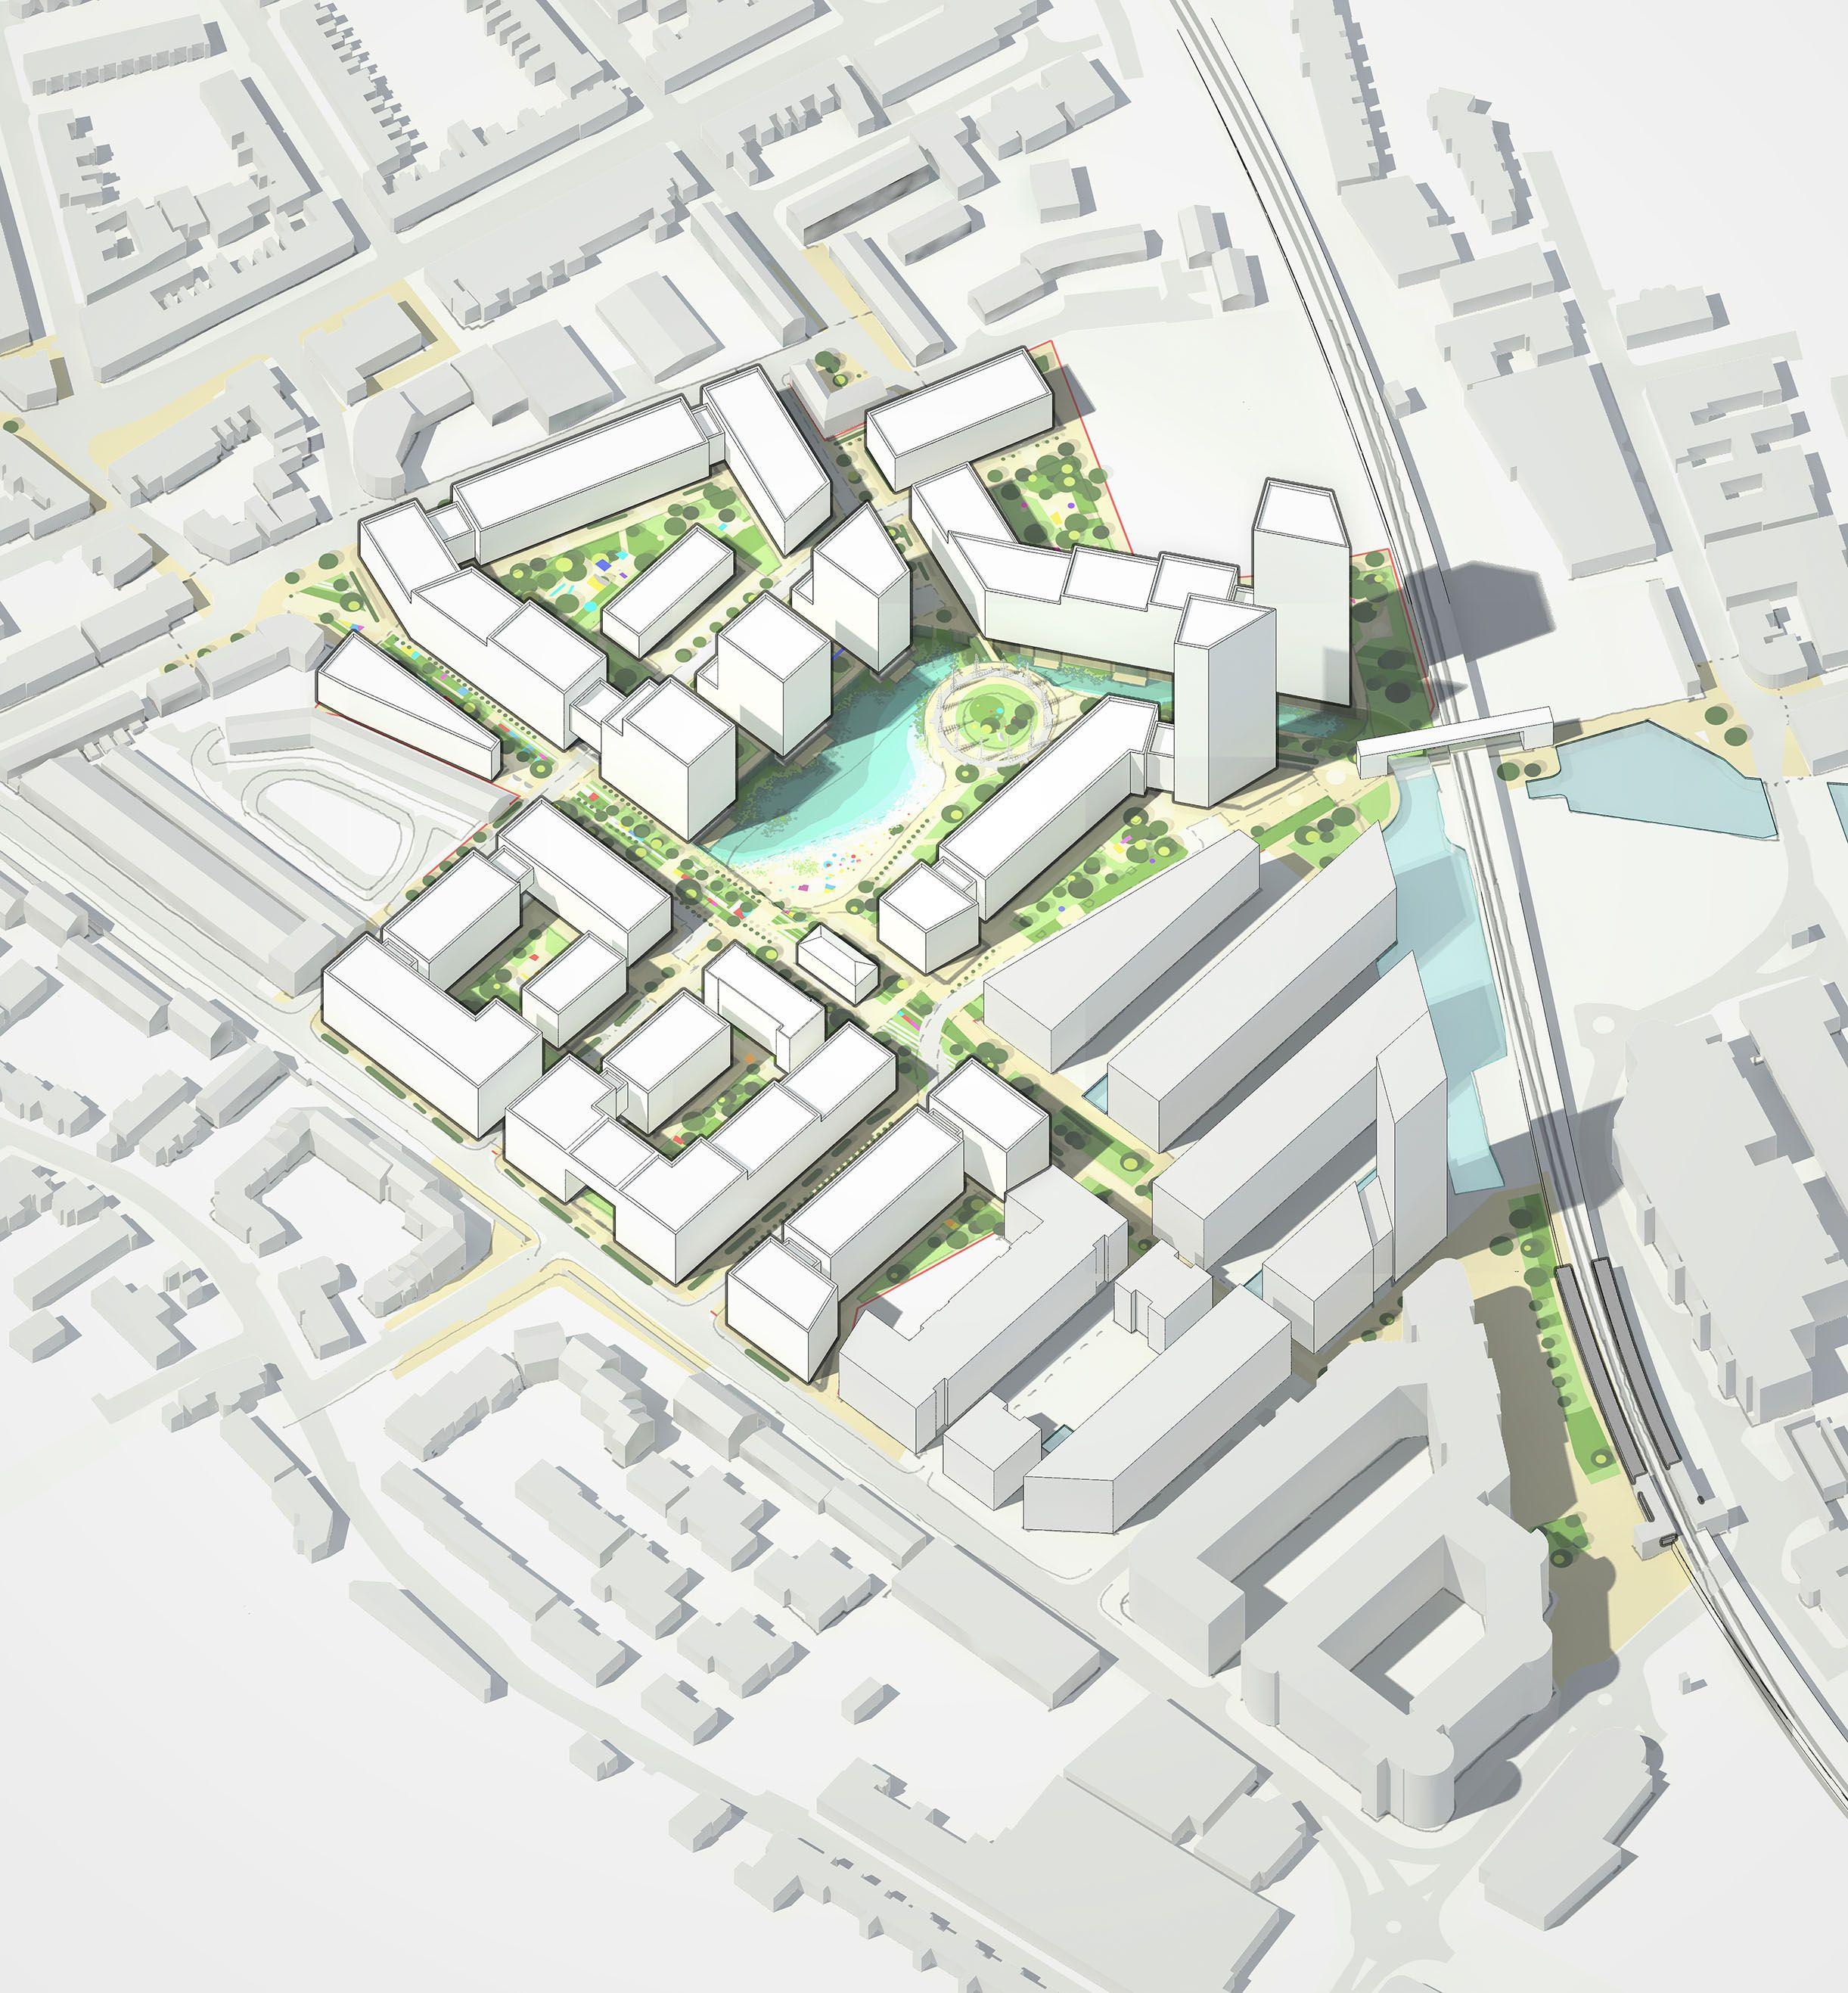 Project team: LDA Design, London | Diagrams | Urban design concept